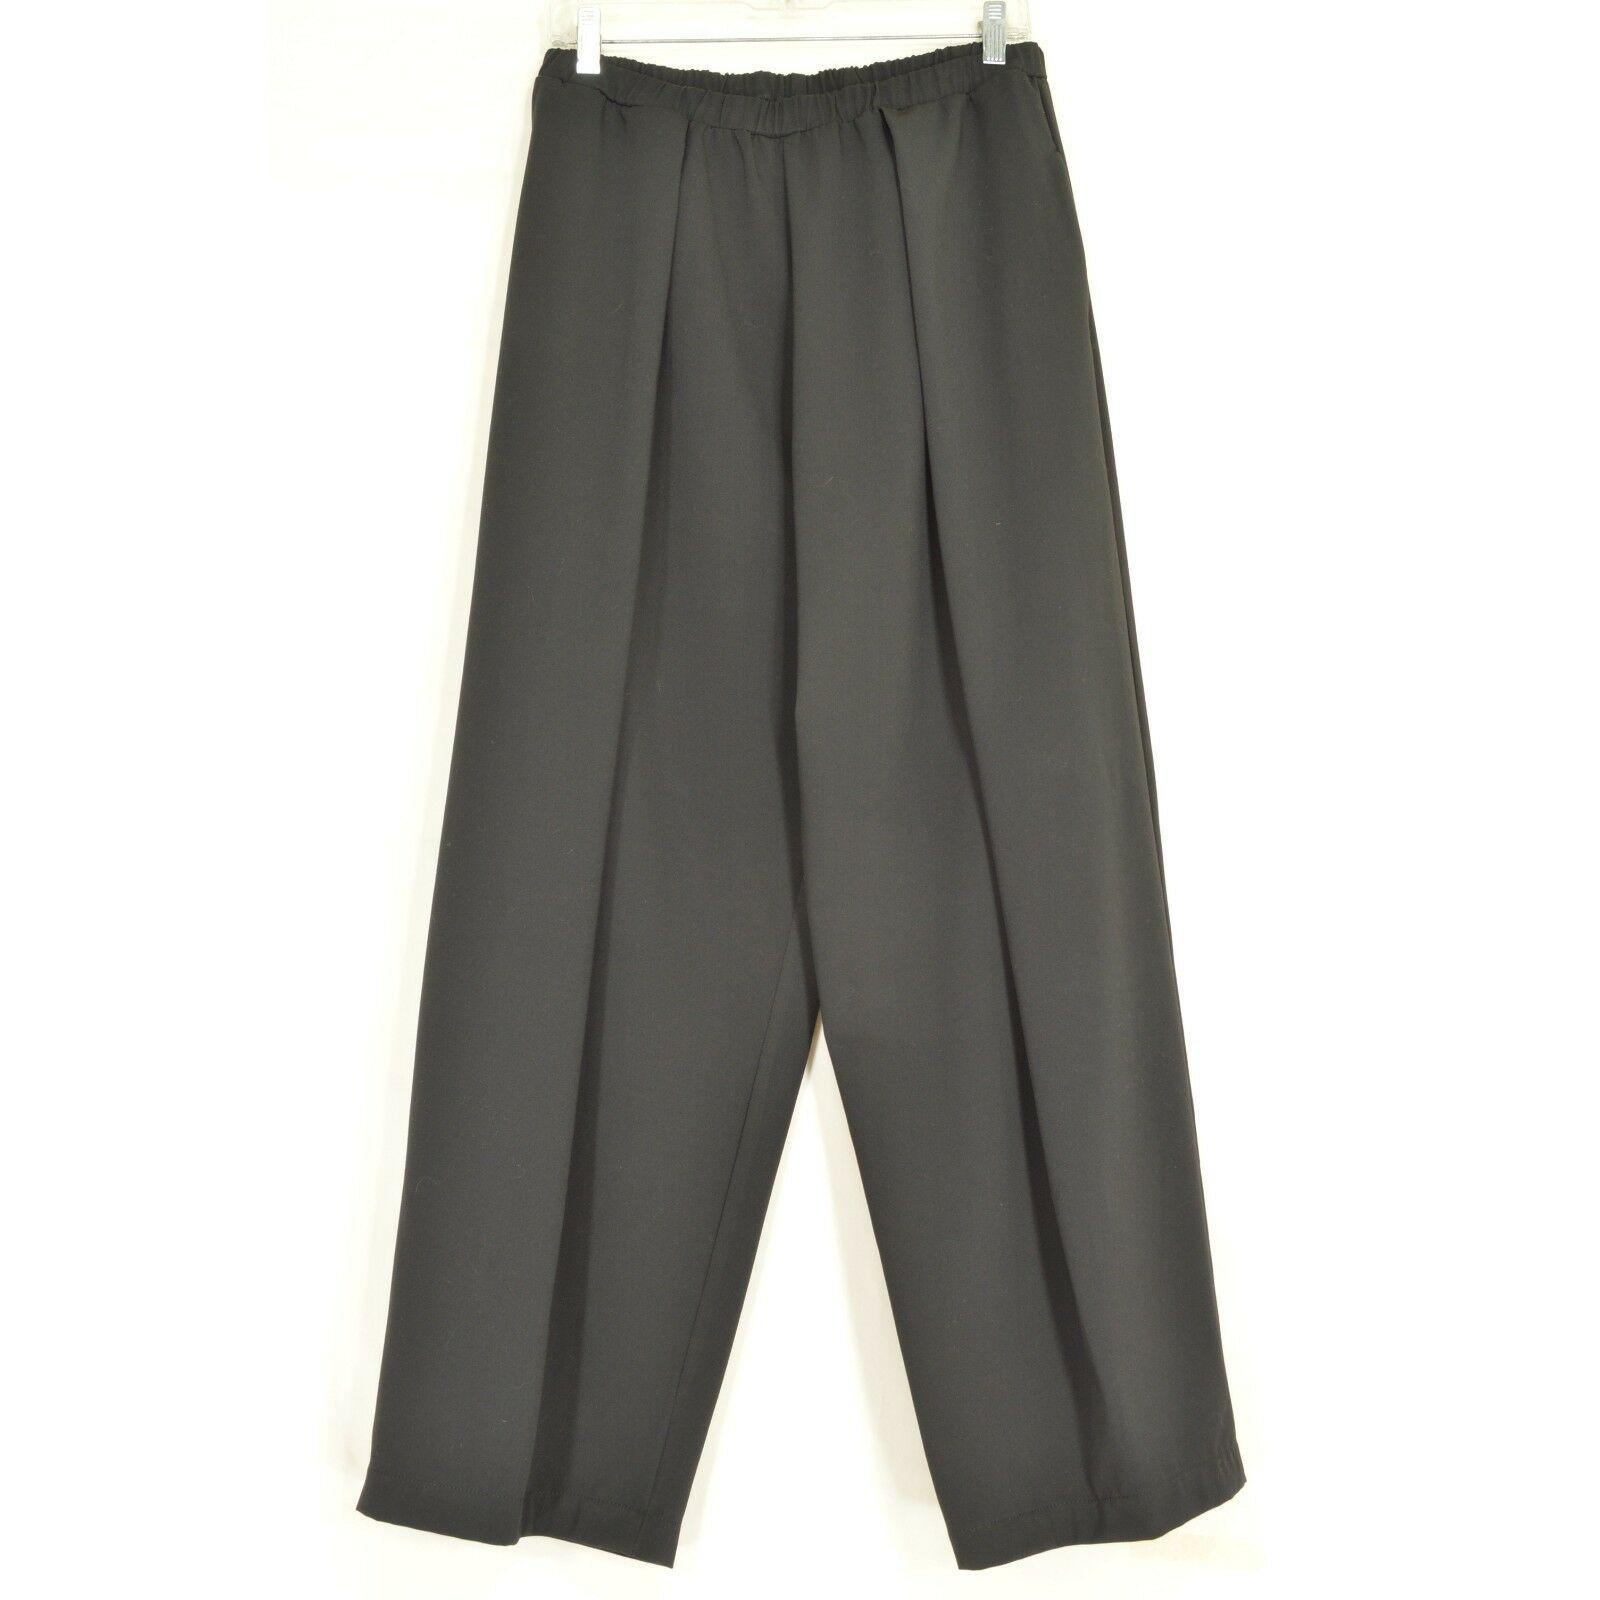 Planet Lauren Grossman pants SZ 3 black Lagenlook wide leg pleat pockets USA